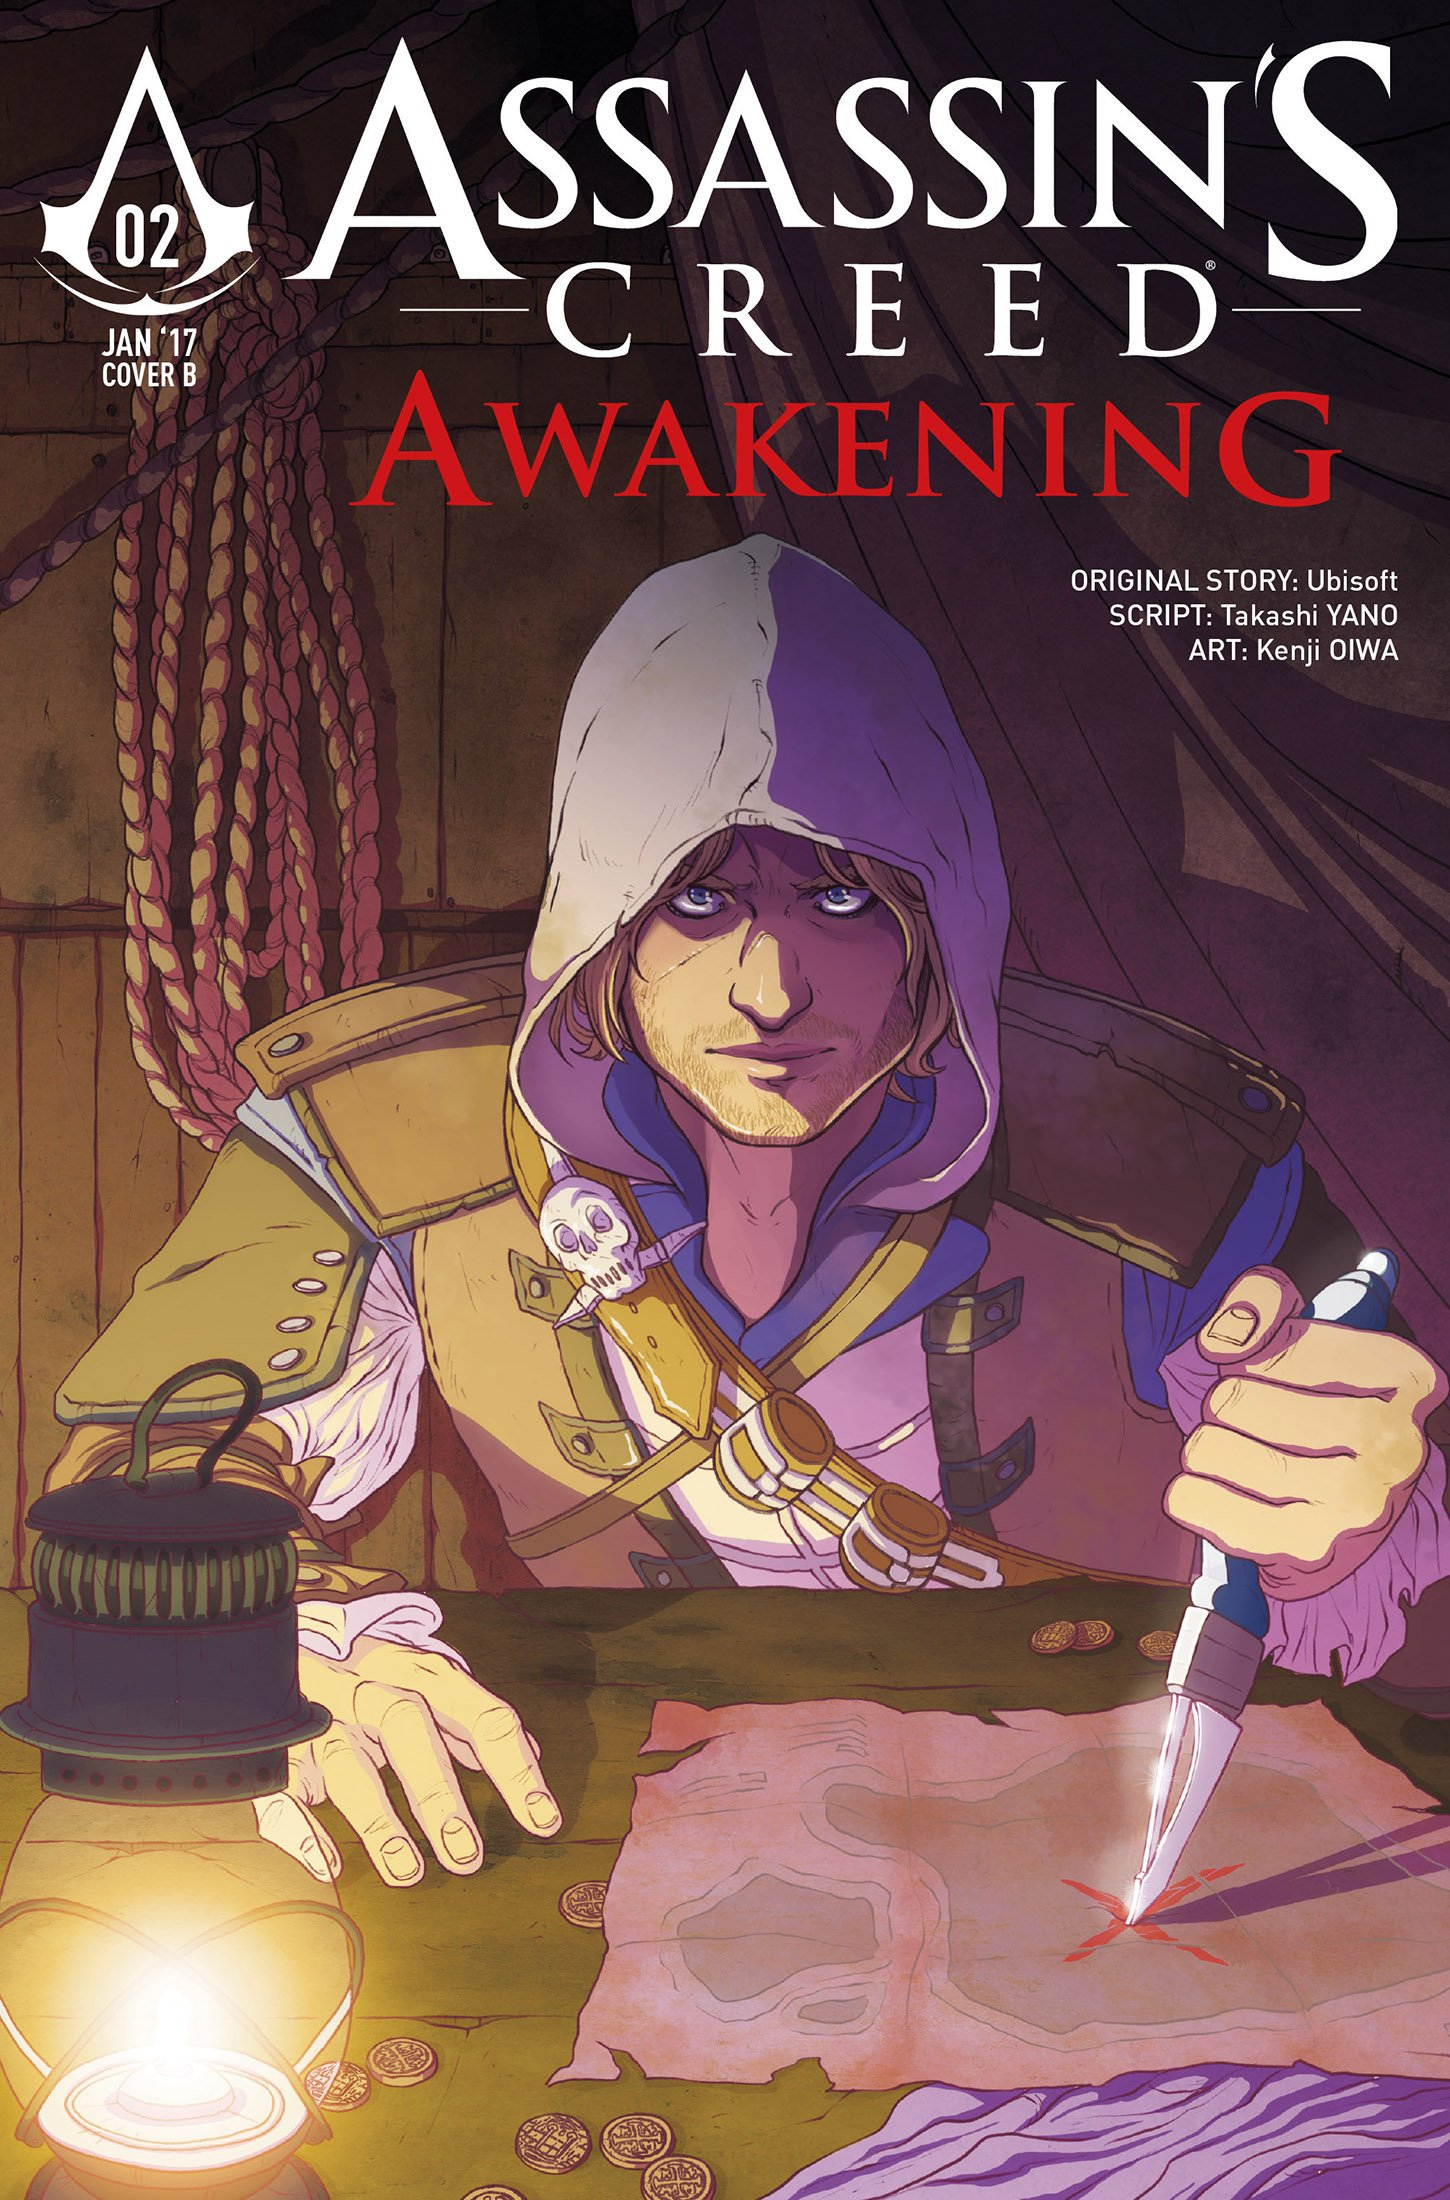 Assassin's Creed - Awakening 02 (January 2017) (cover b)